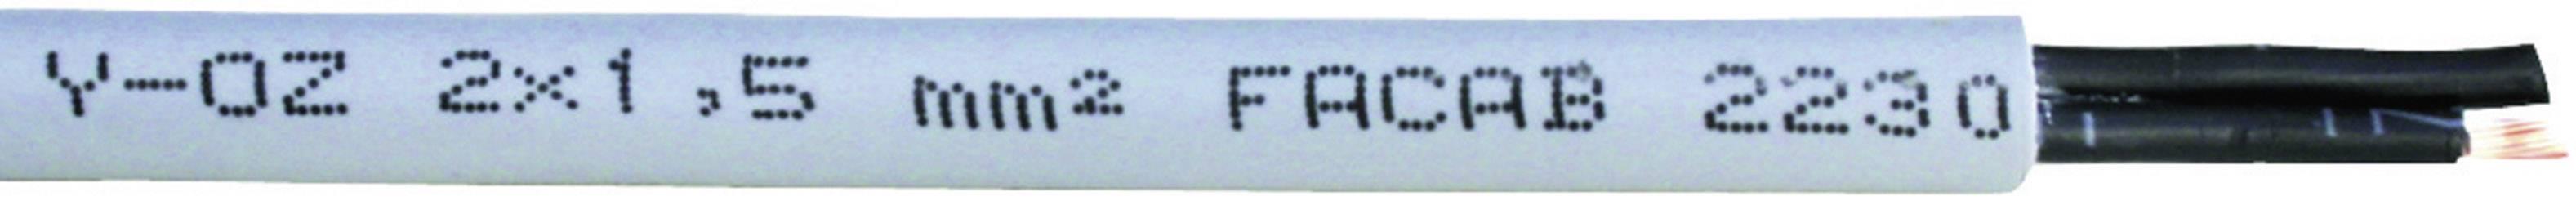 Riadiaci kábel Faber Kabel YSLY-OZ 030549, 5 x 0.75 mm², vonkajší Ø 7 mm, 500 V, metrový tovar, sivá